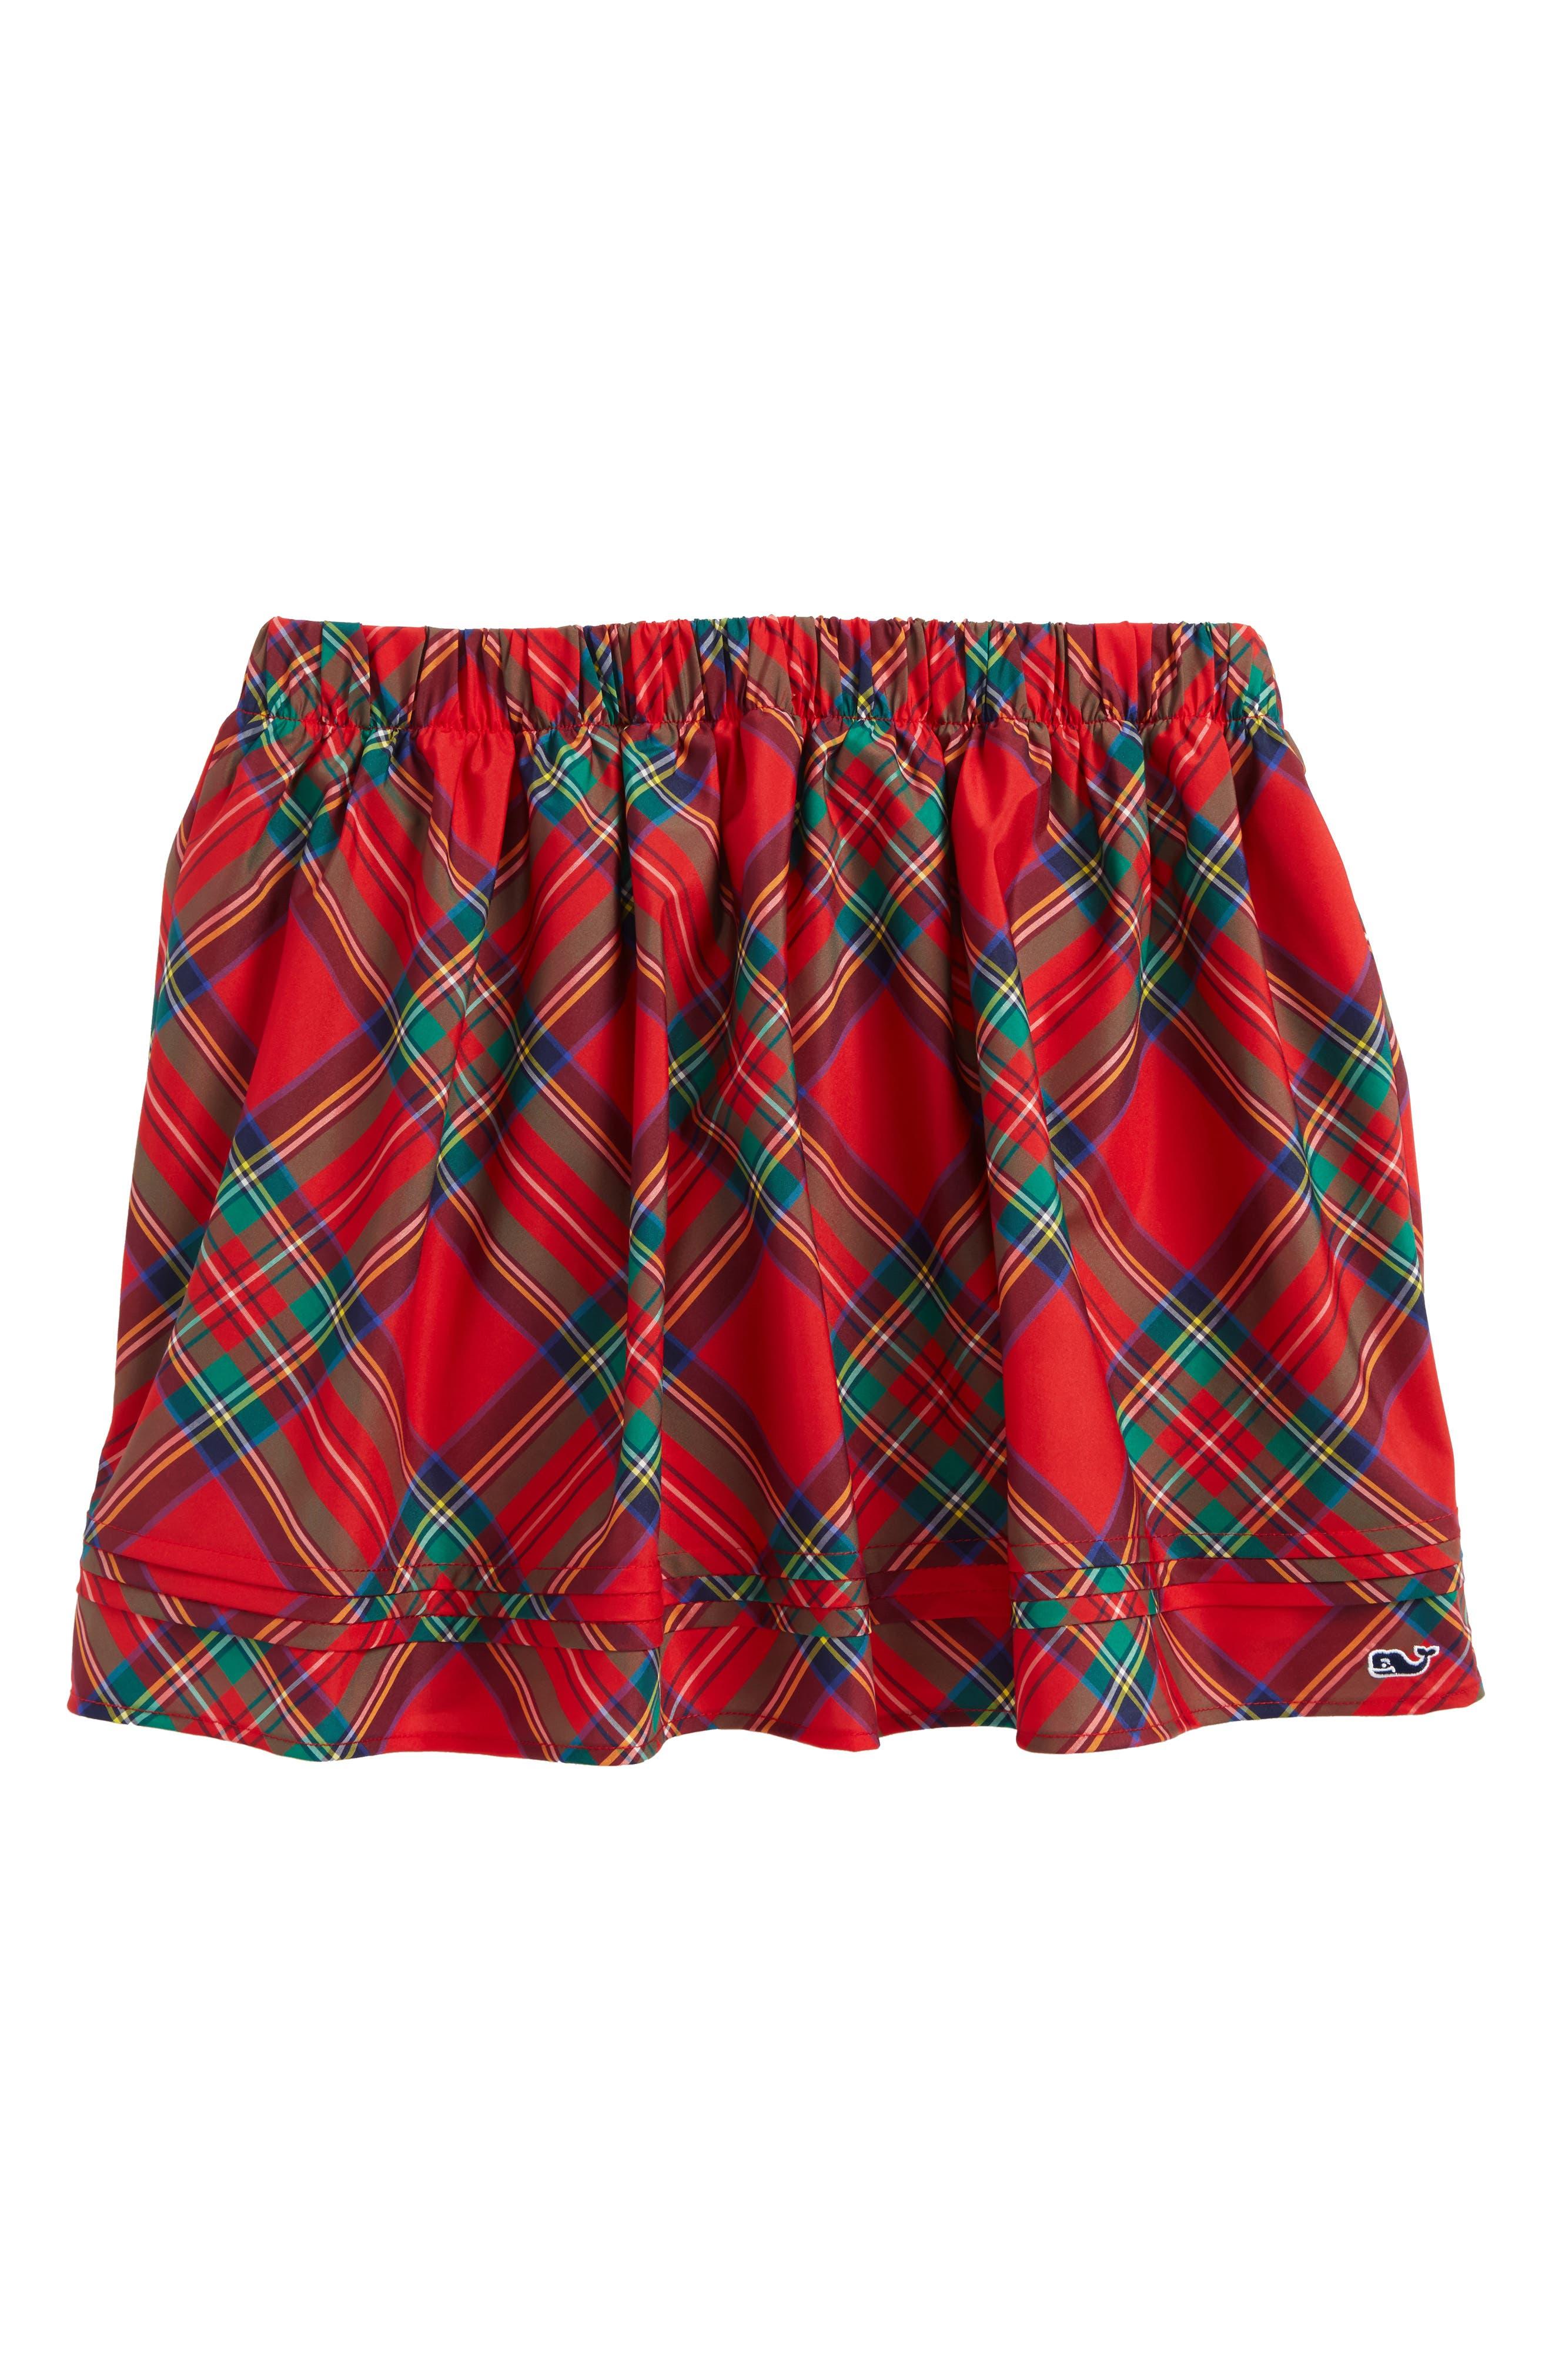 Main Image - vineyard vines Jolly Plaid Holiday Skirt (Little Girls & Big Girls)